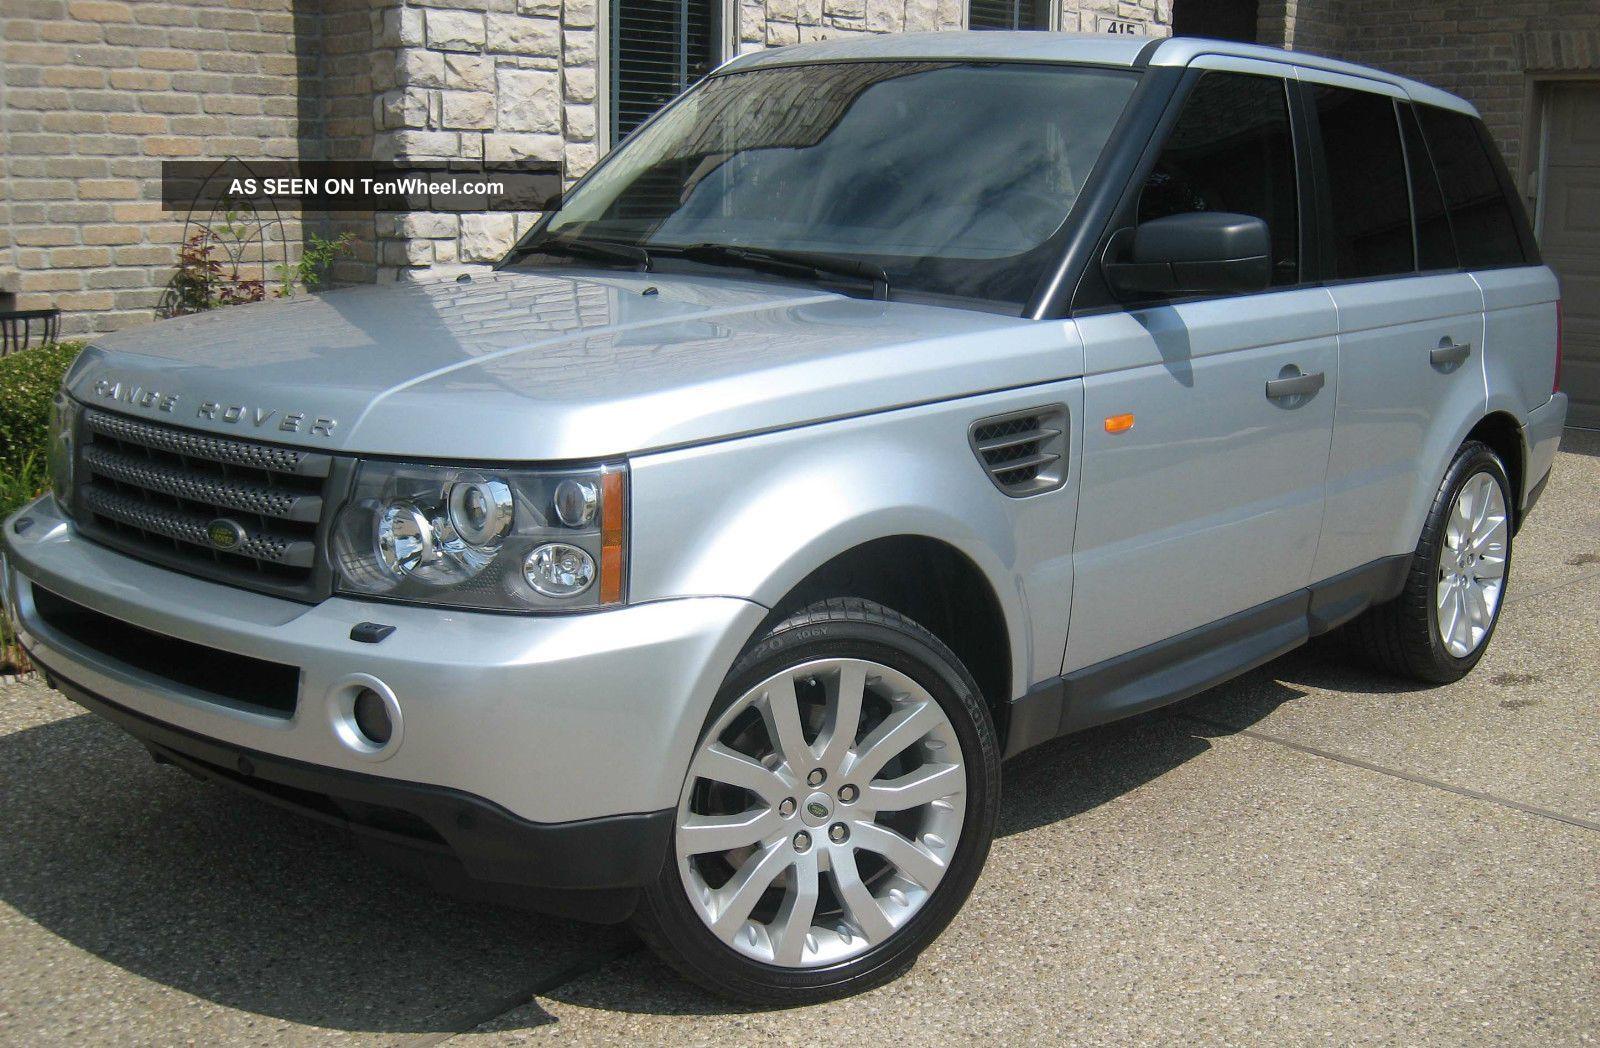 2006 land rover range rover sport hse 20 wheels luxury. Black Bedroom Furniture Sets. Home Design Ideas